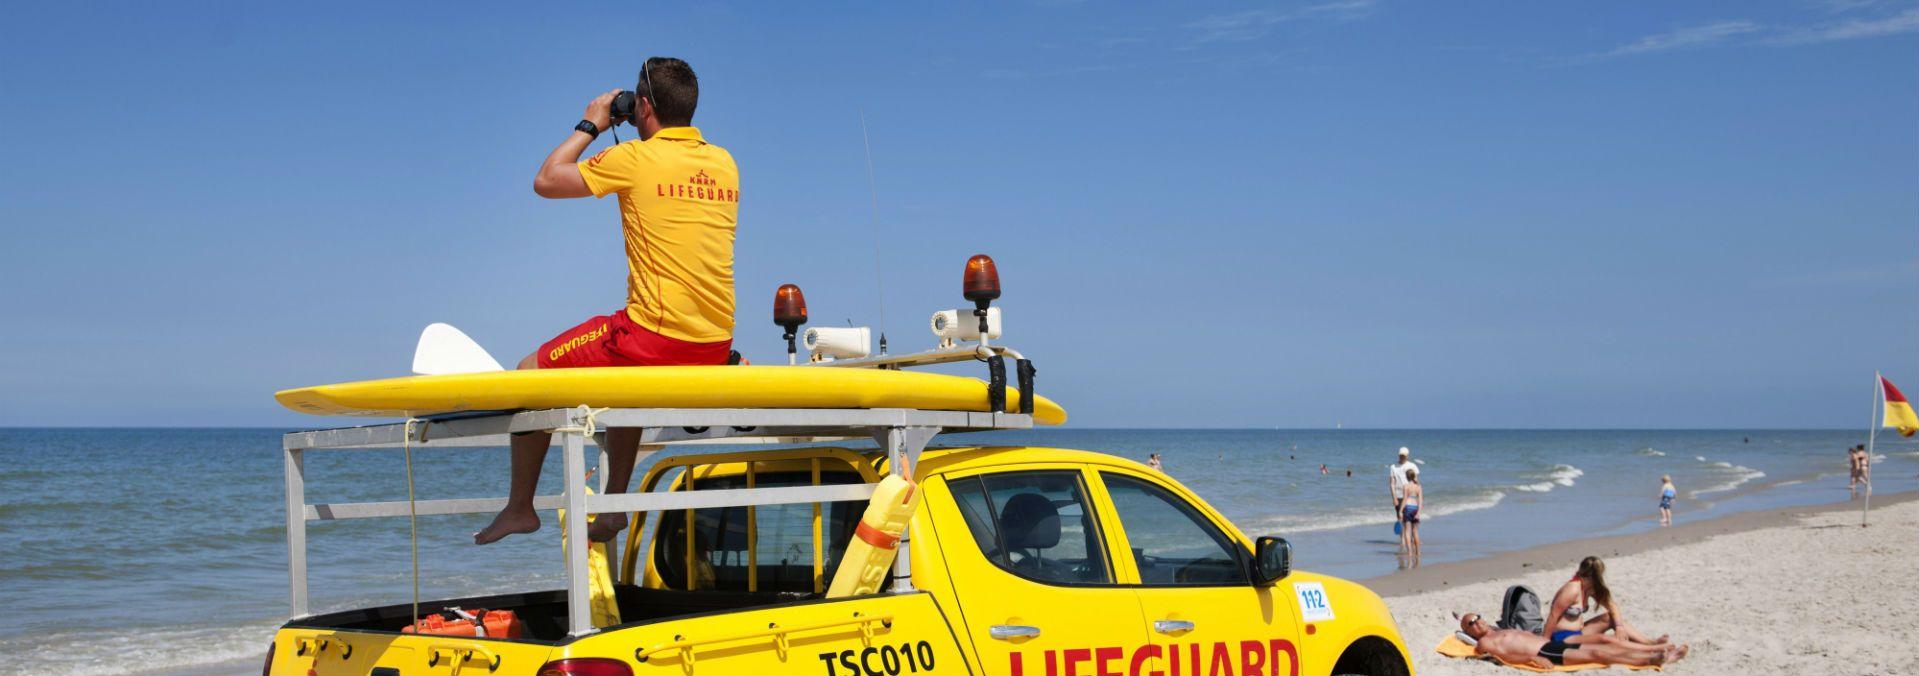 Lifeguard Terschelling | Fotograaf Olaf Kraak